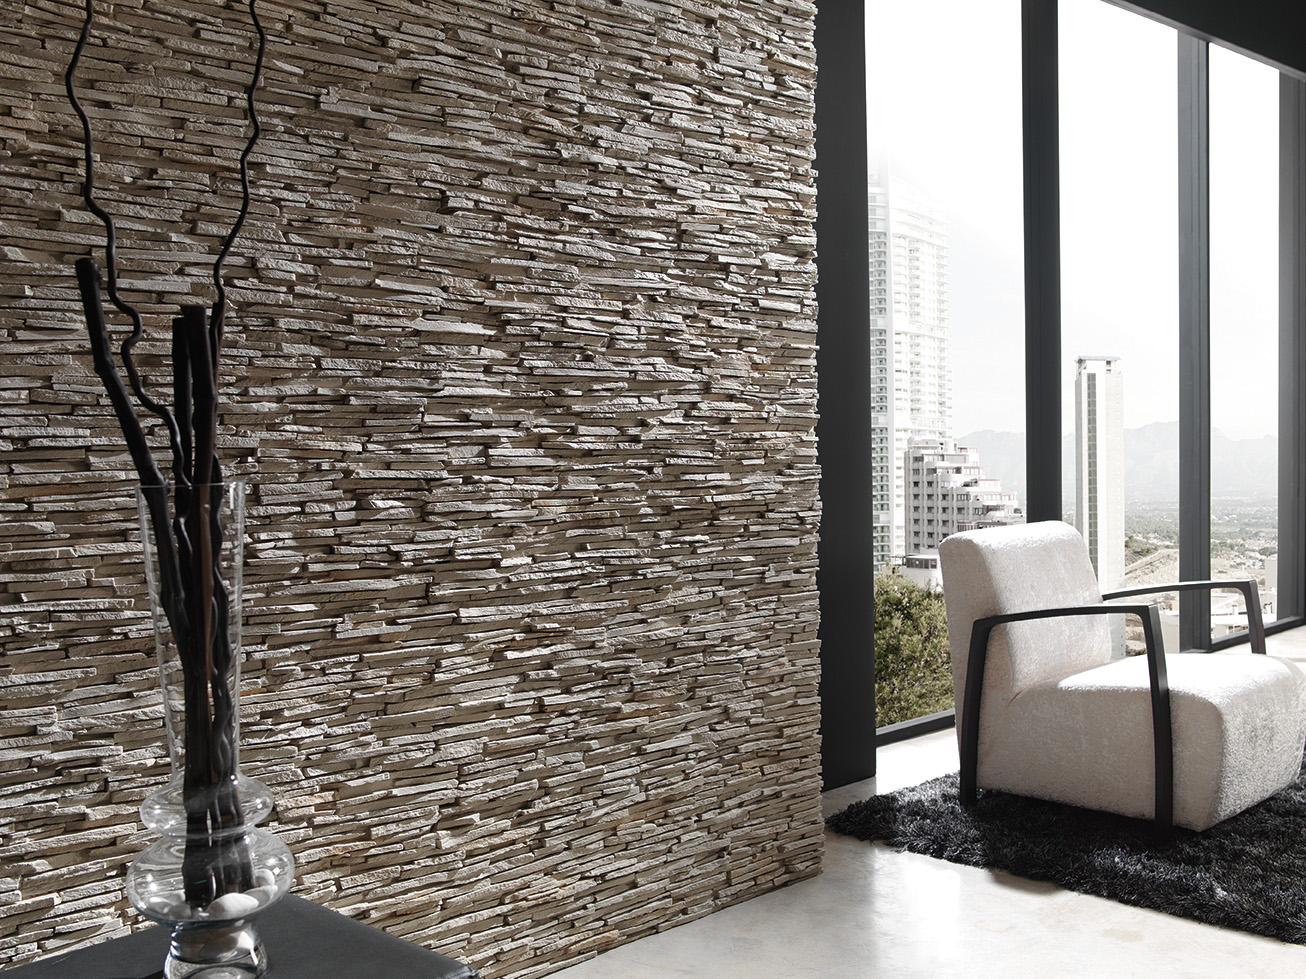 Panel piedra pizarra alepes - Placas para decorar paredes ...